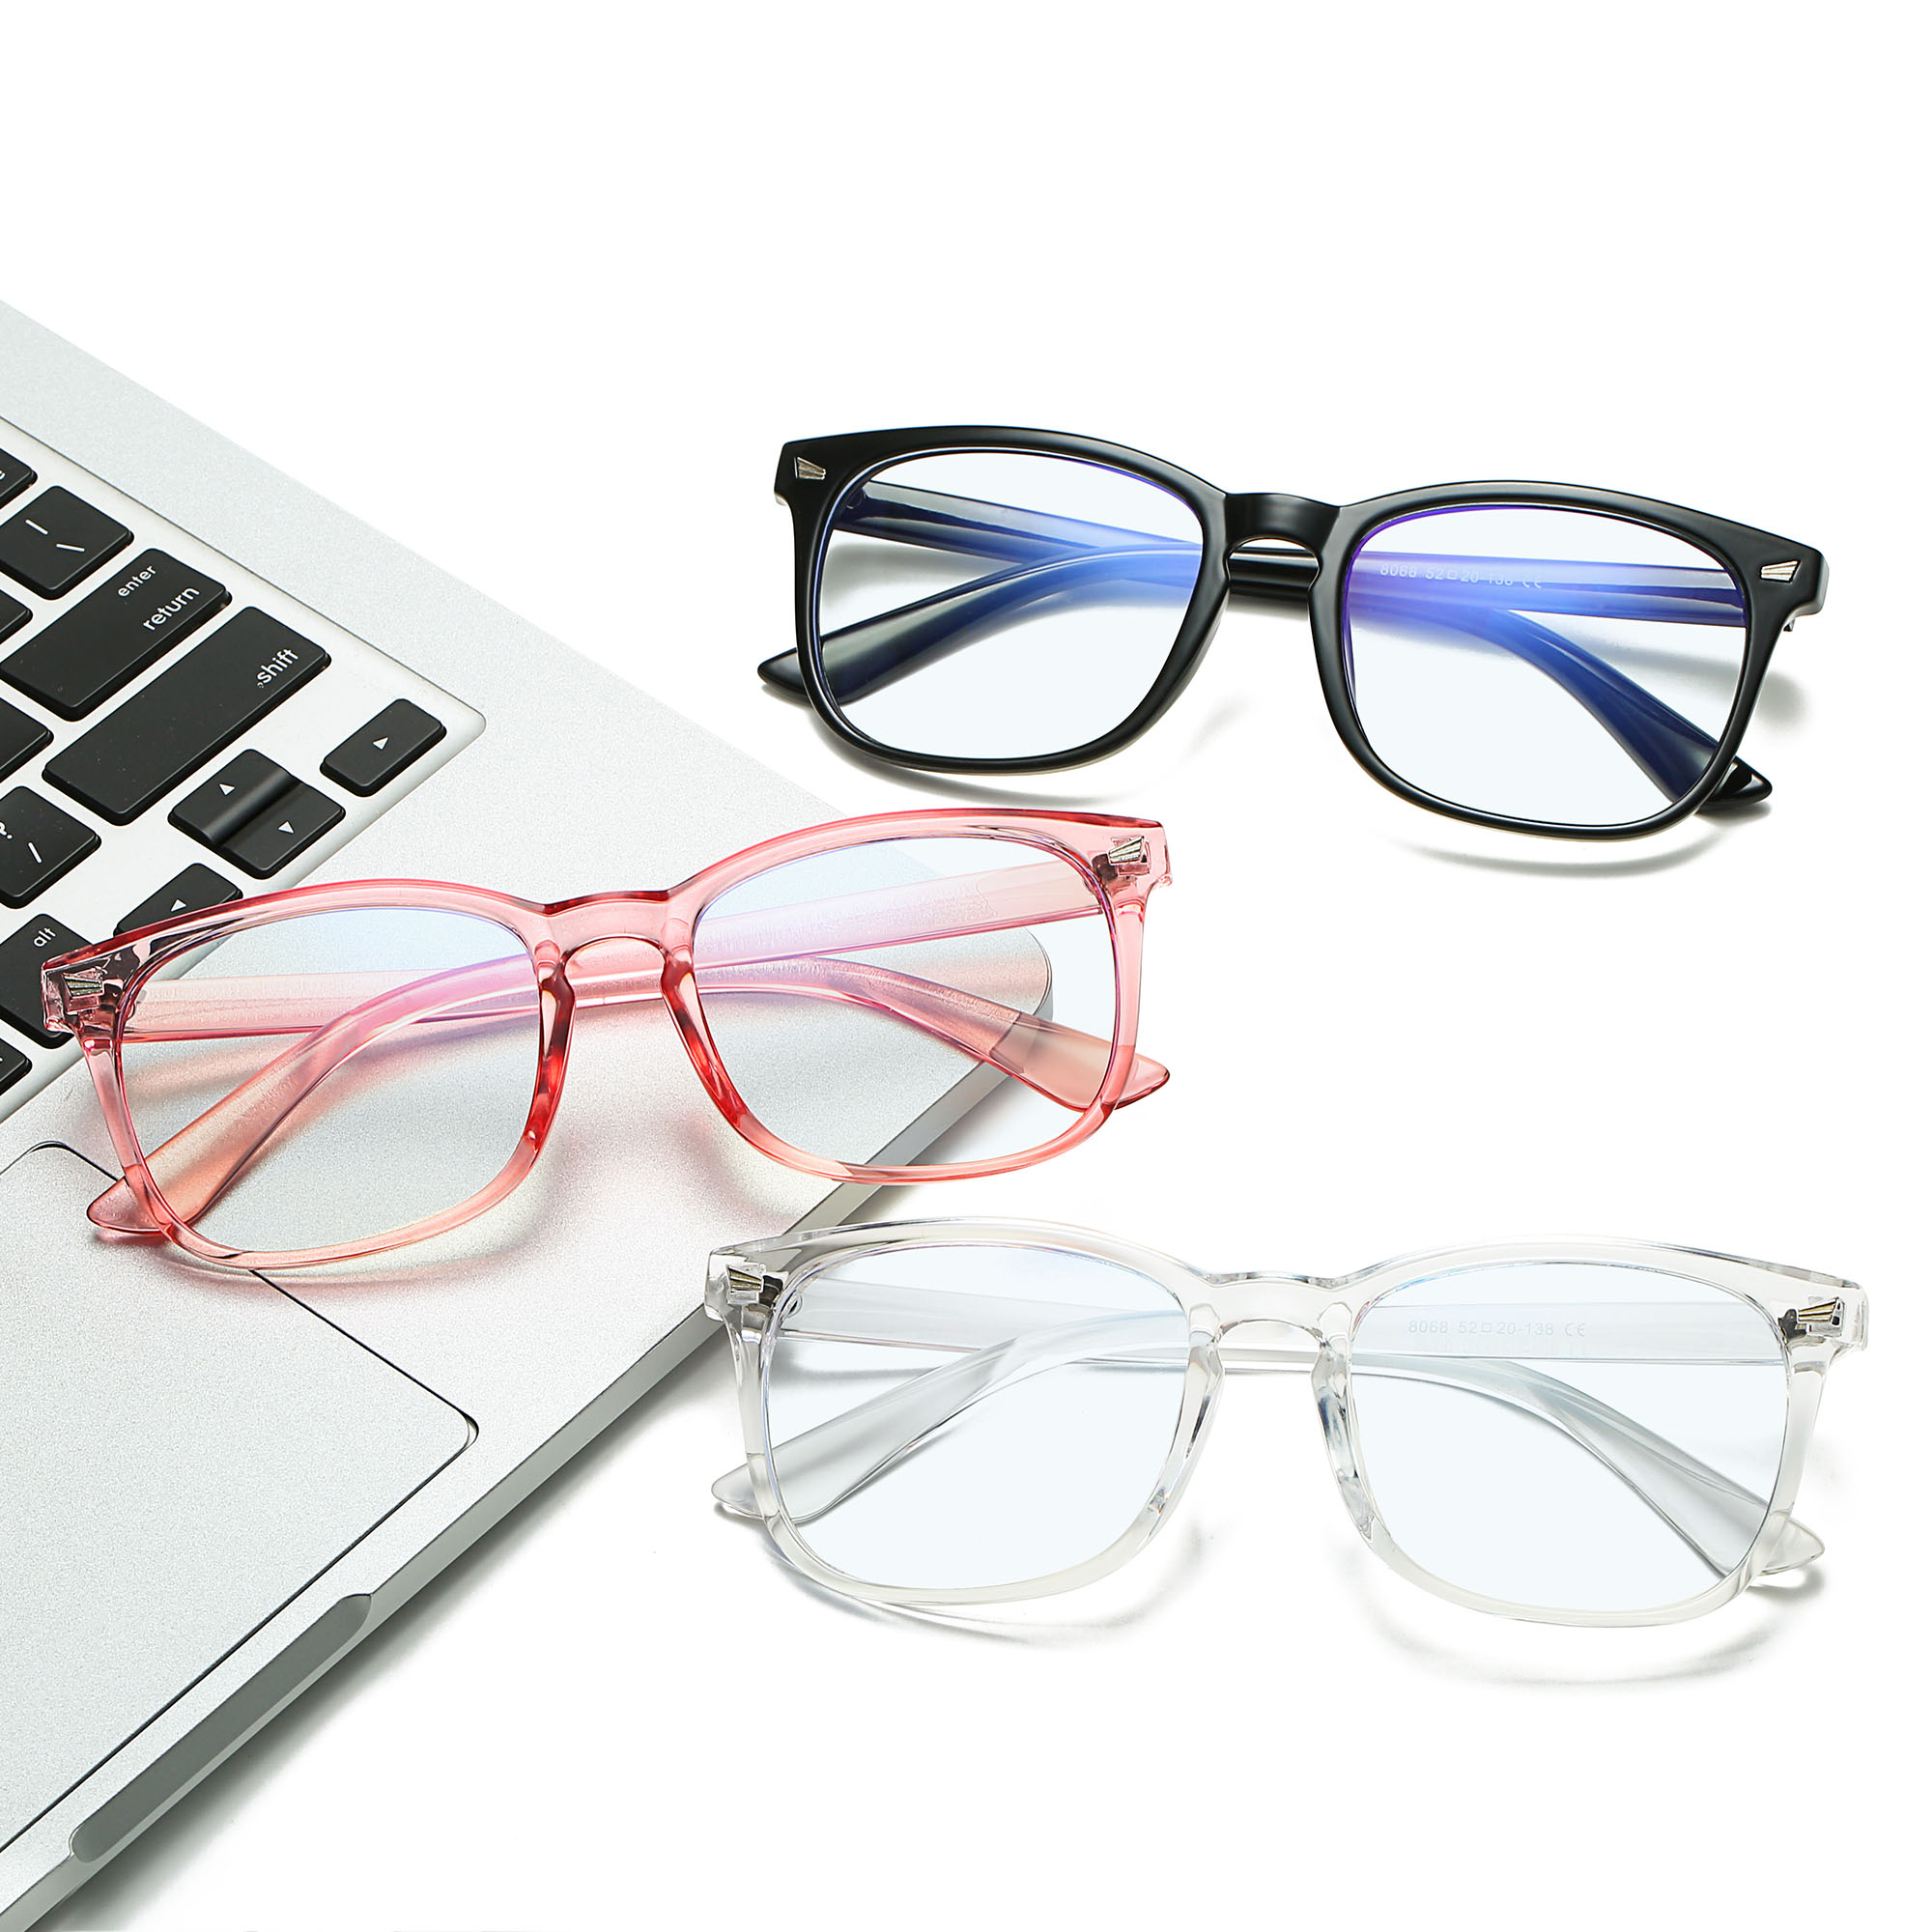 Retro Square Frame Anti blue light filter blocking glasses Gaming Computer Glasses 2021